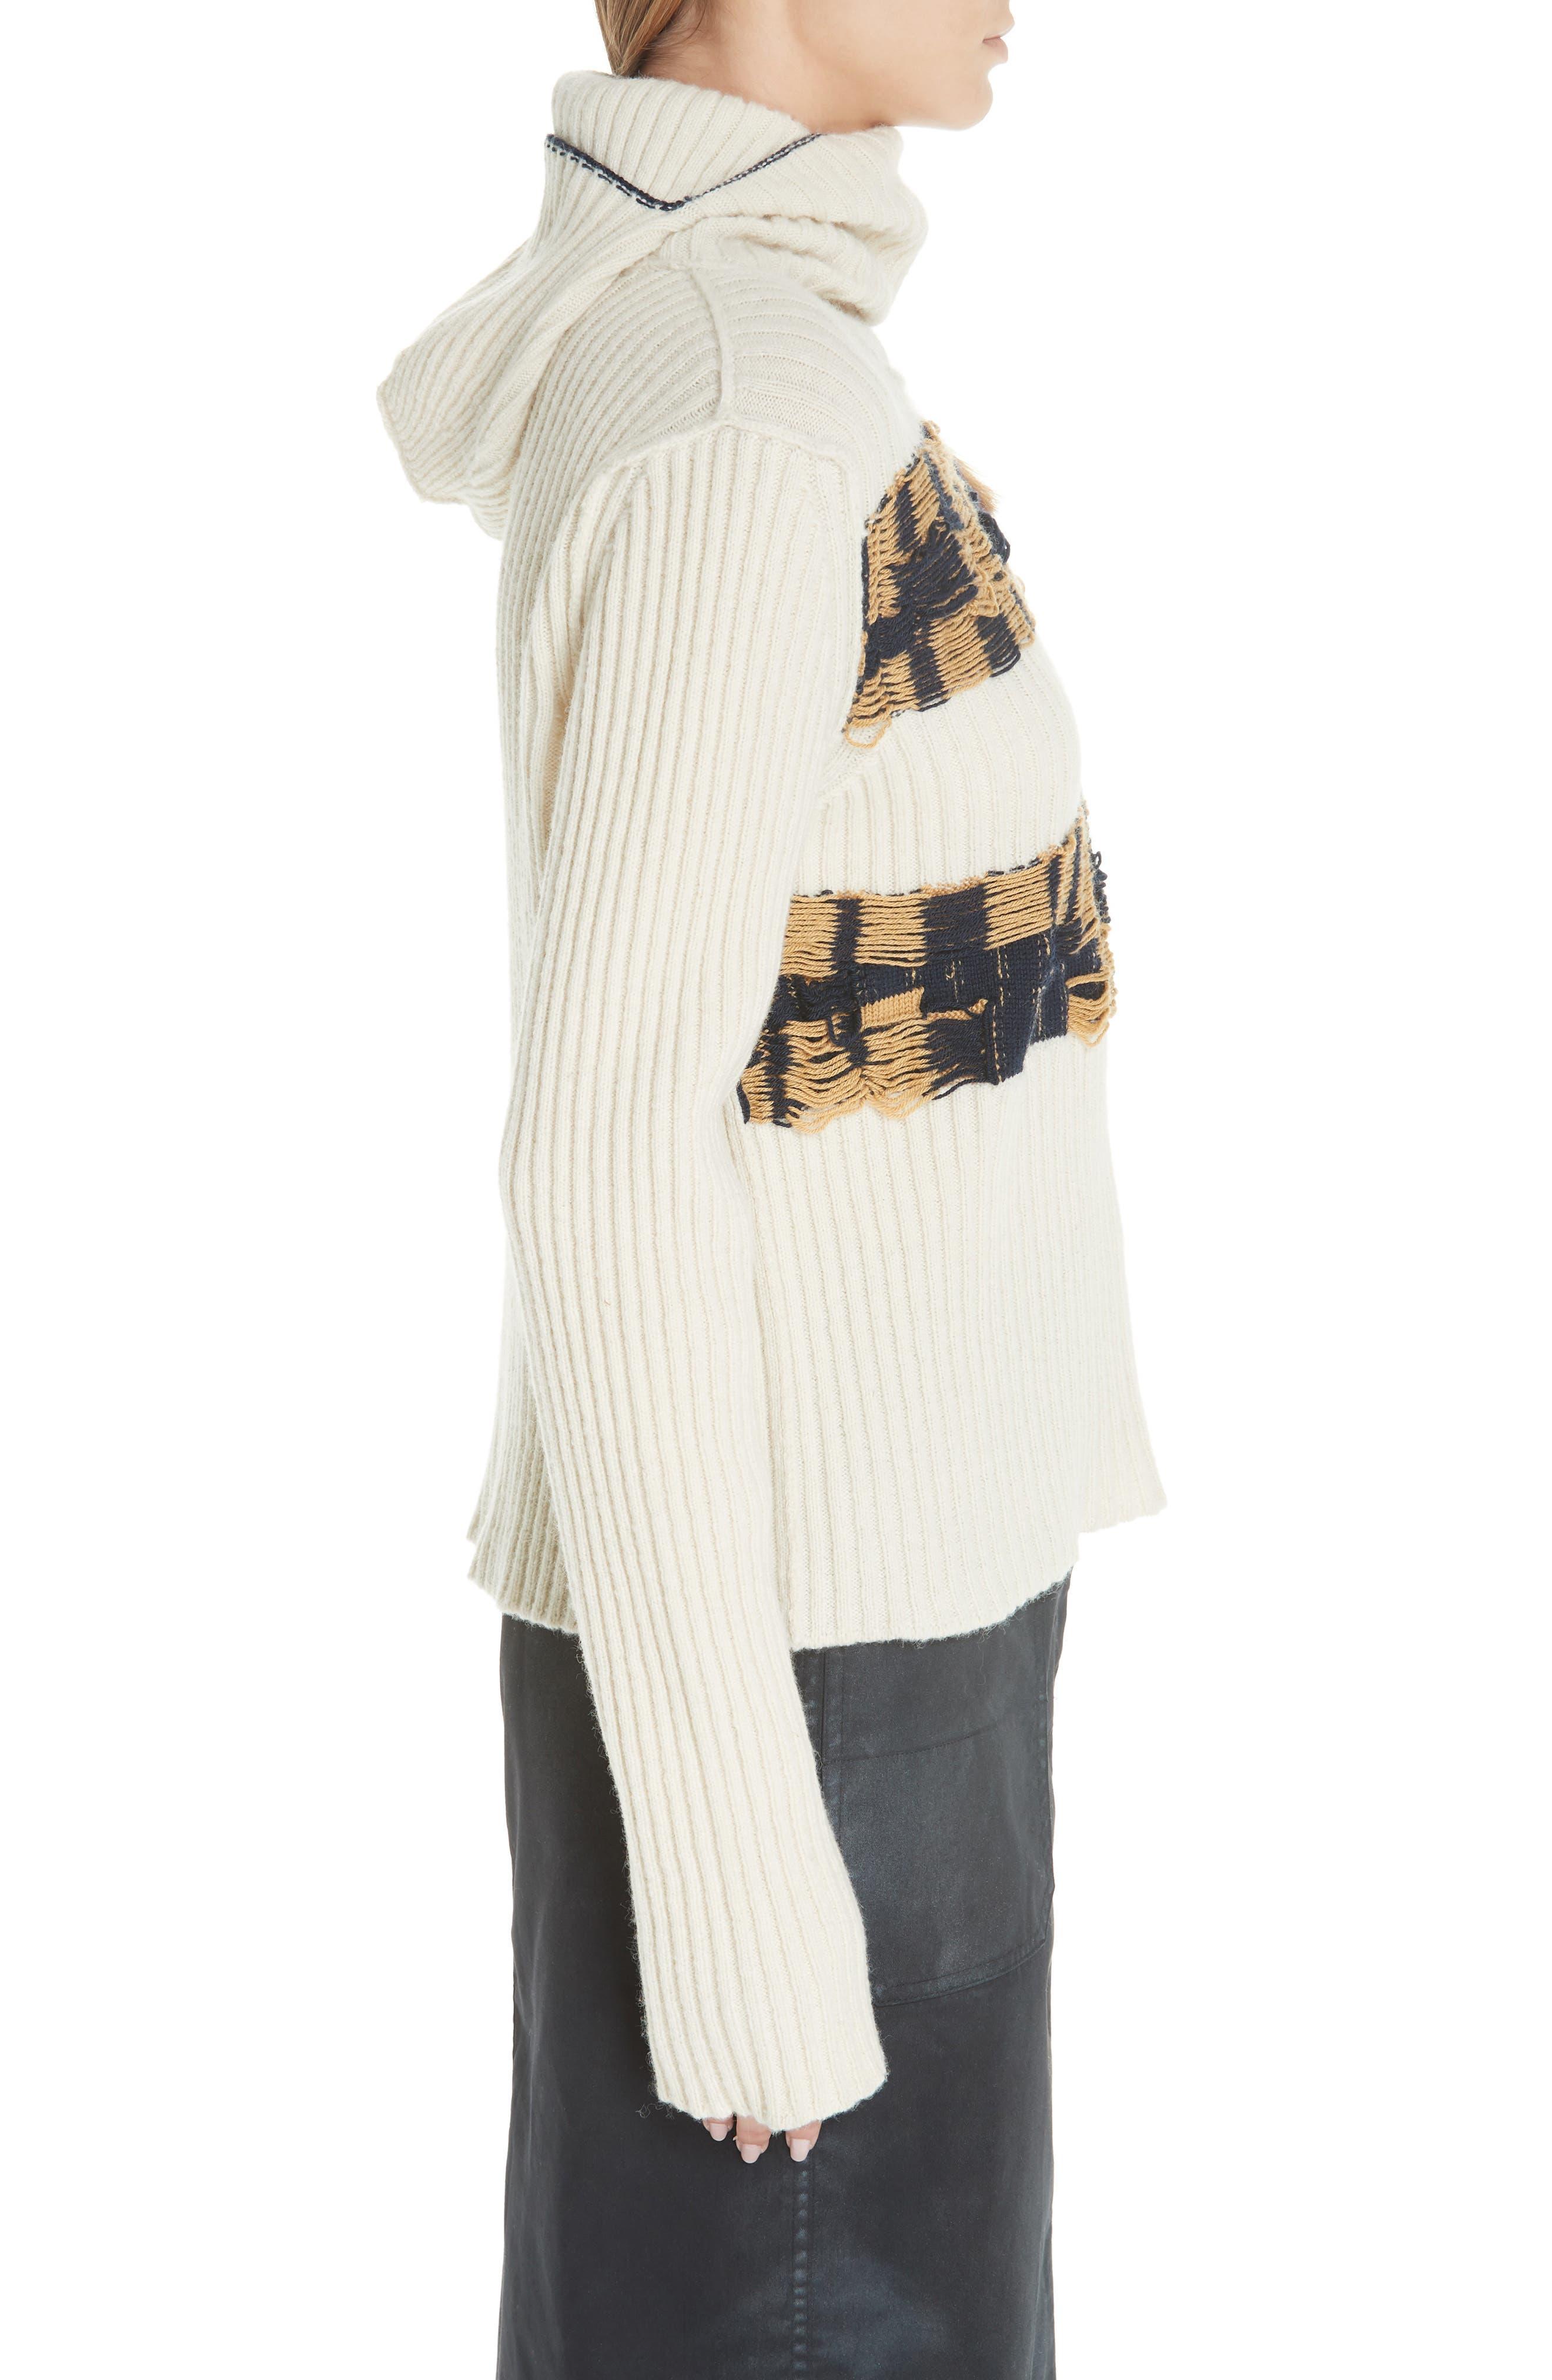 Quilt Jacquard Stripe Sweater,                             Alternate thumbnail 3, color,                             ECRU HAY NAVY